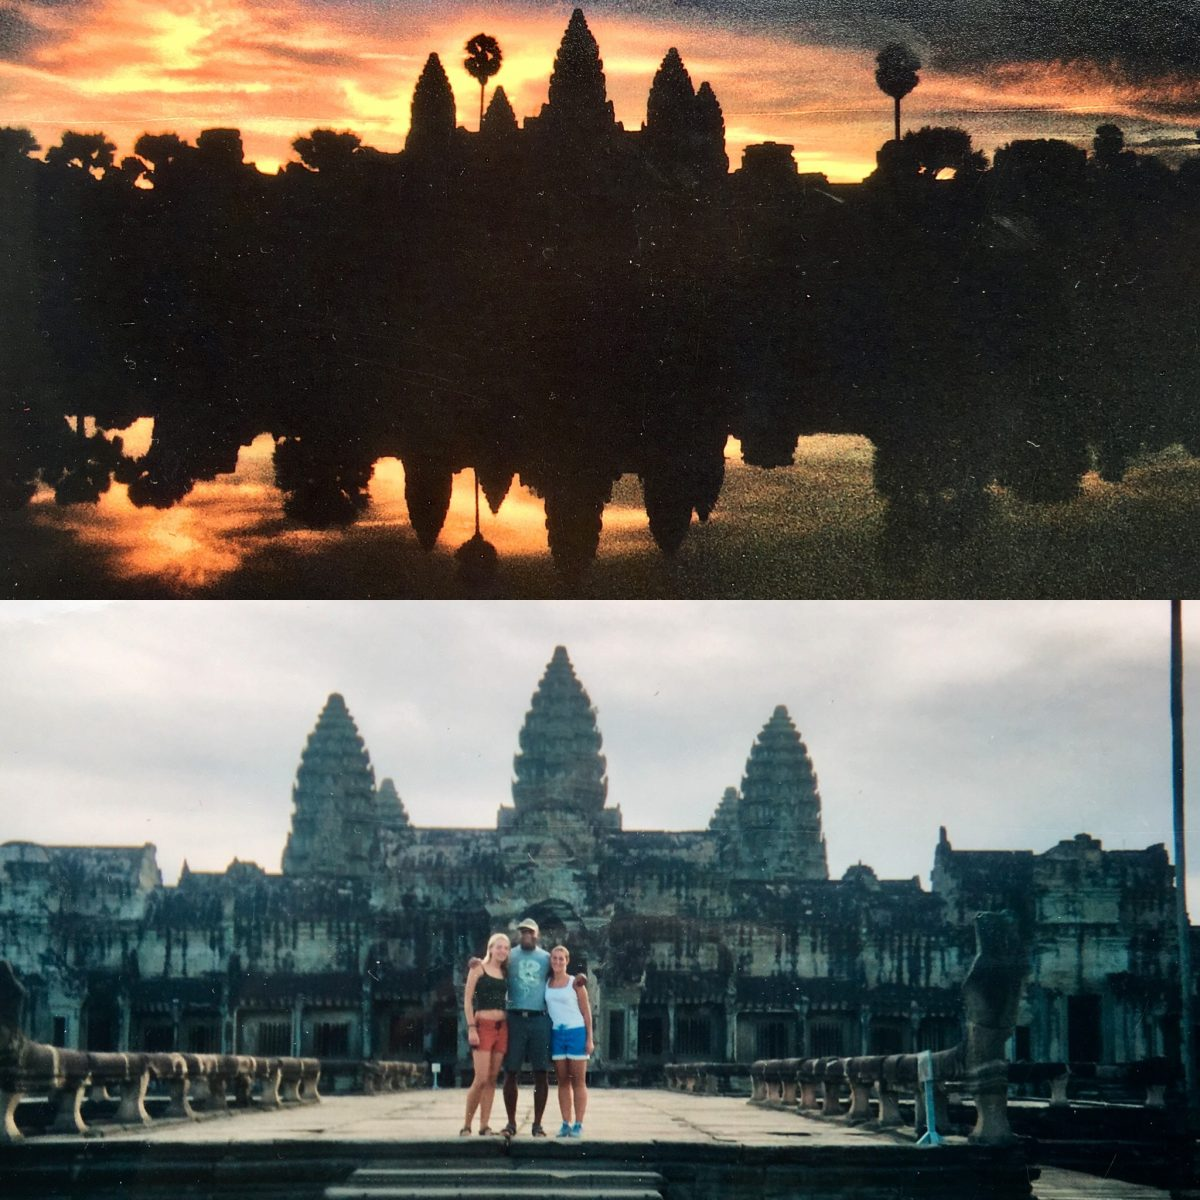 sunrise Angkor wat Cambodia